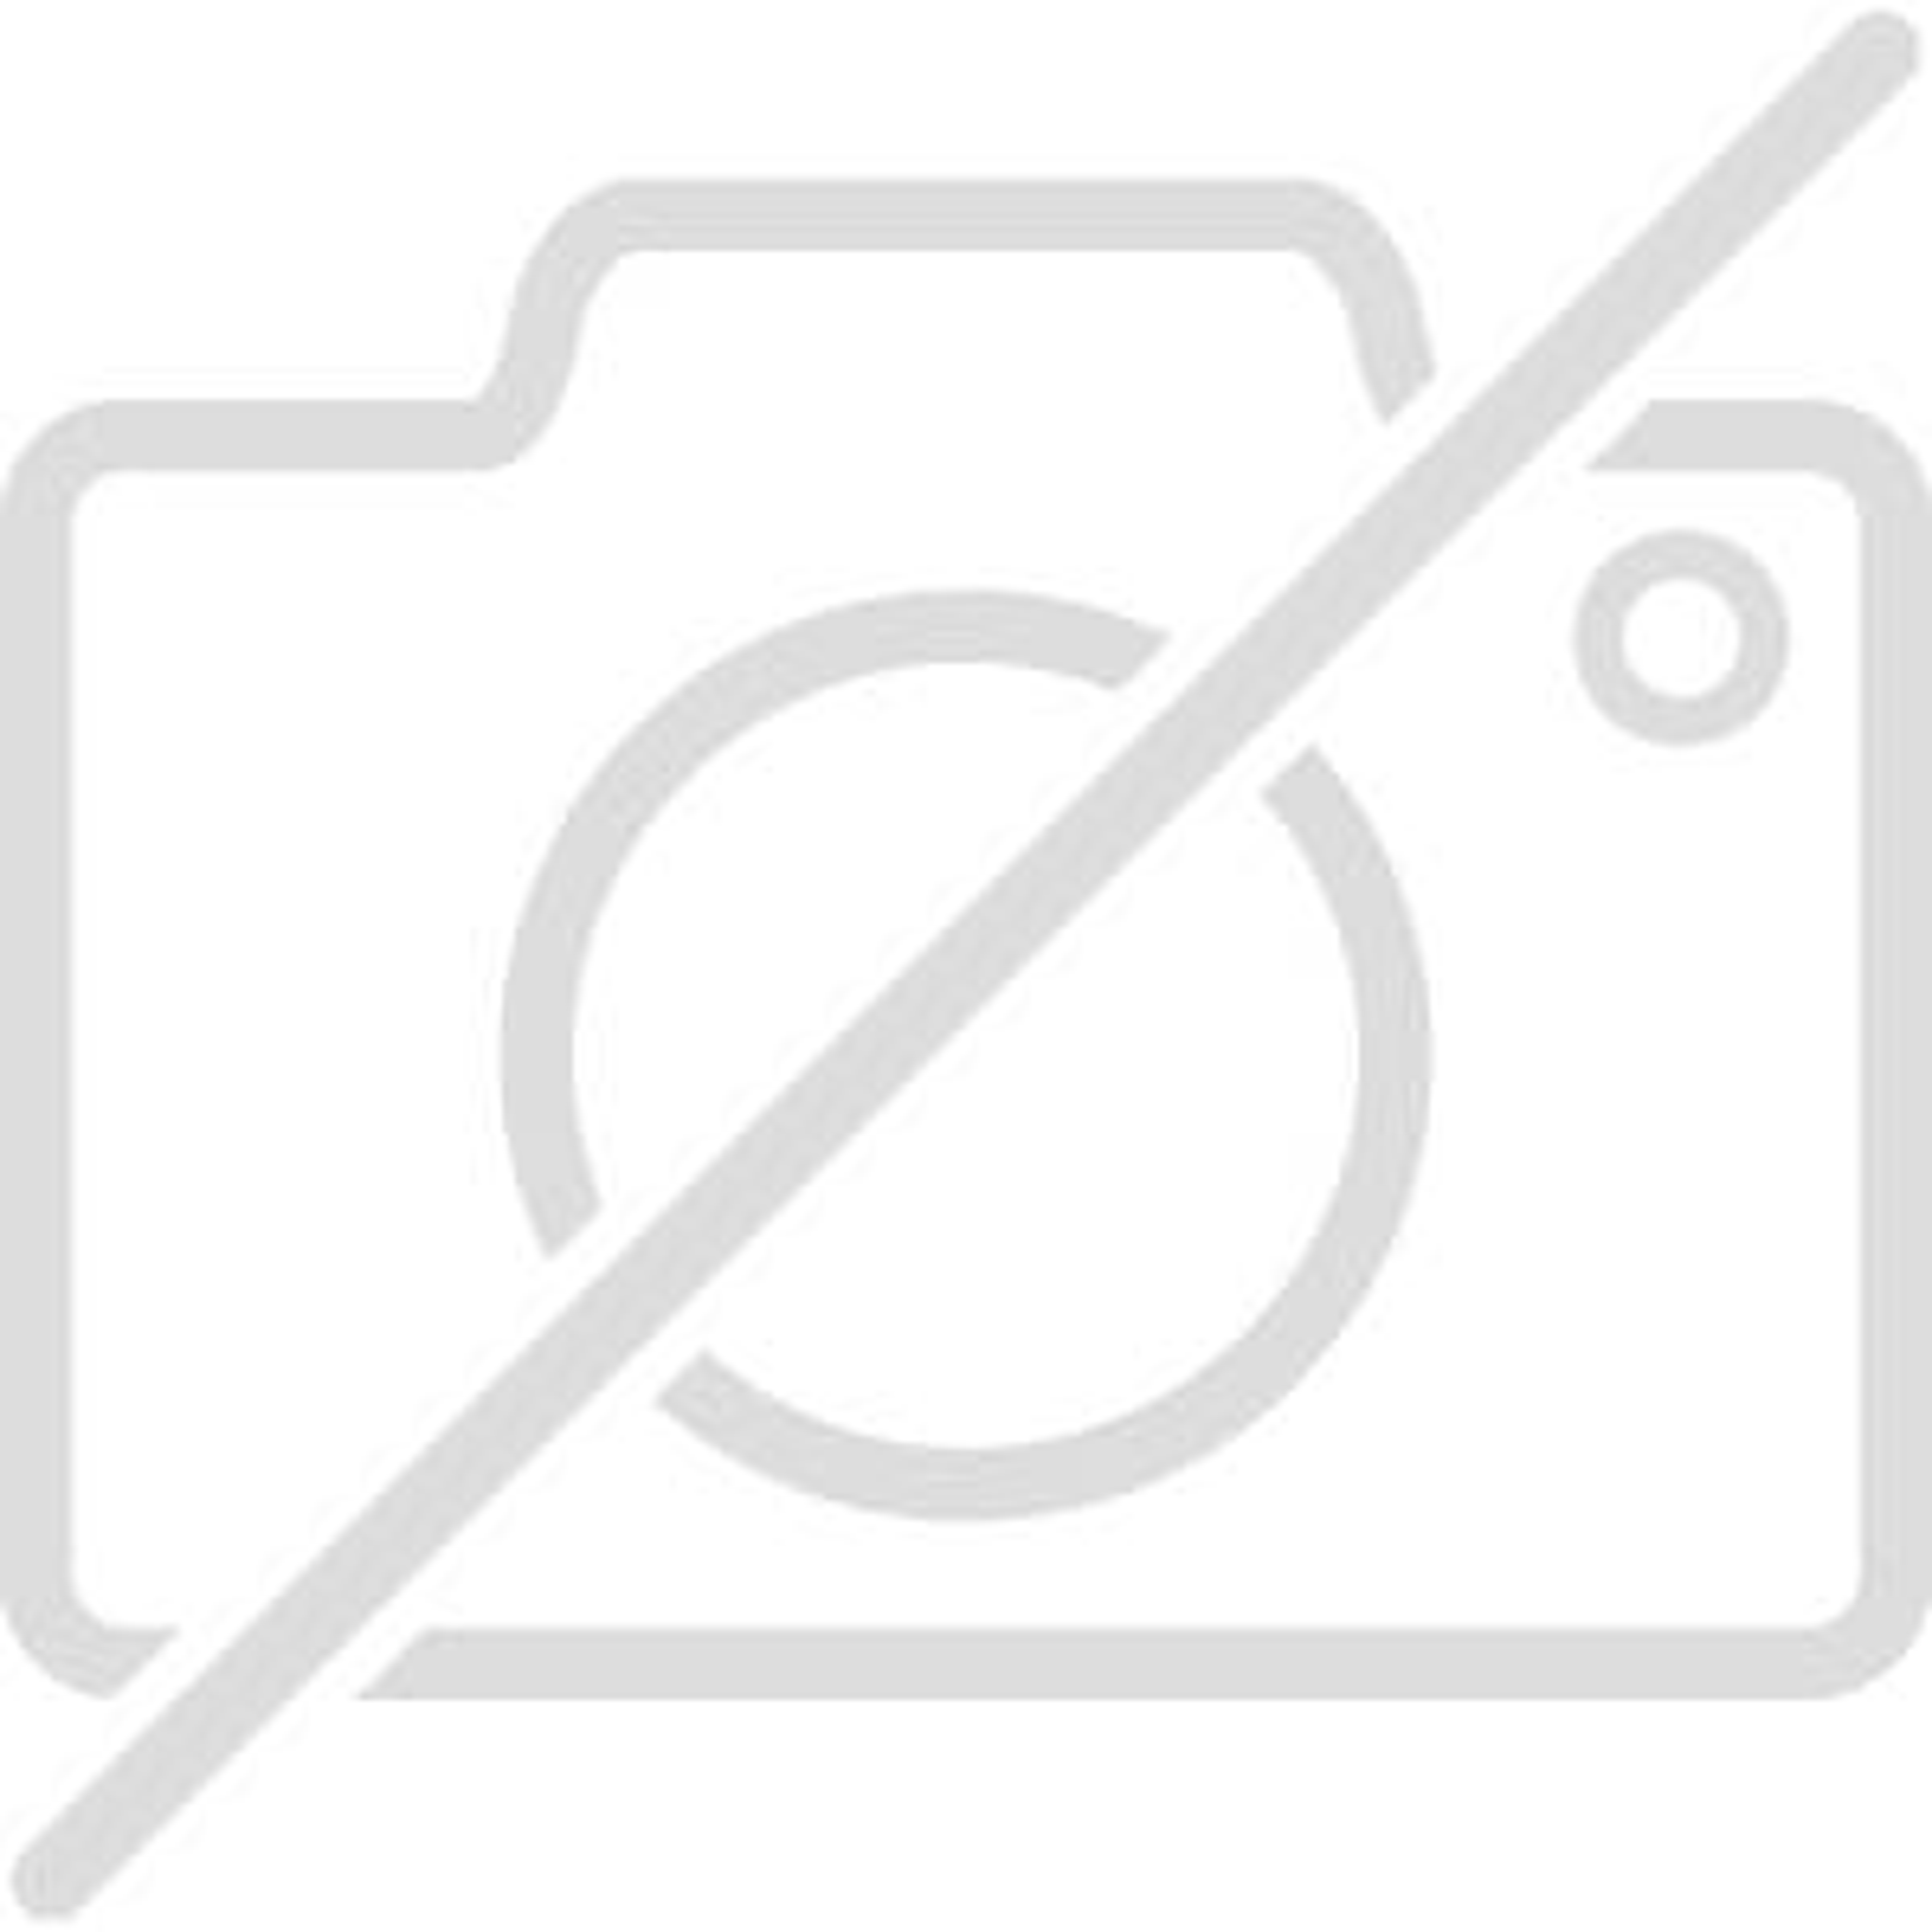 Oviala Parasol droit à manivelle inclinable